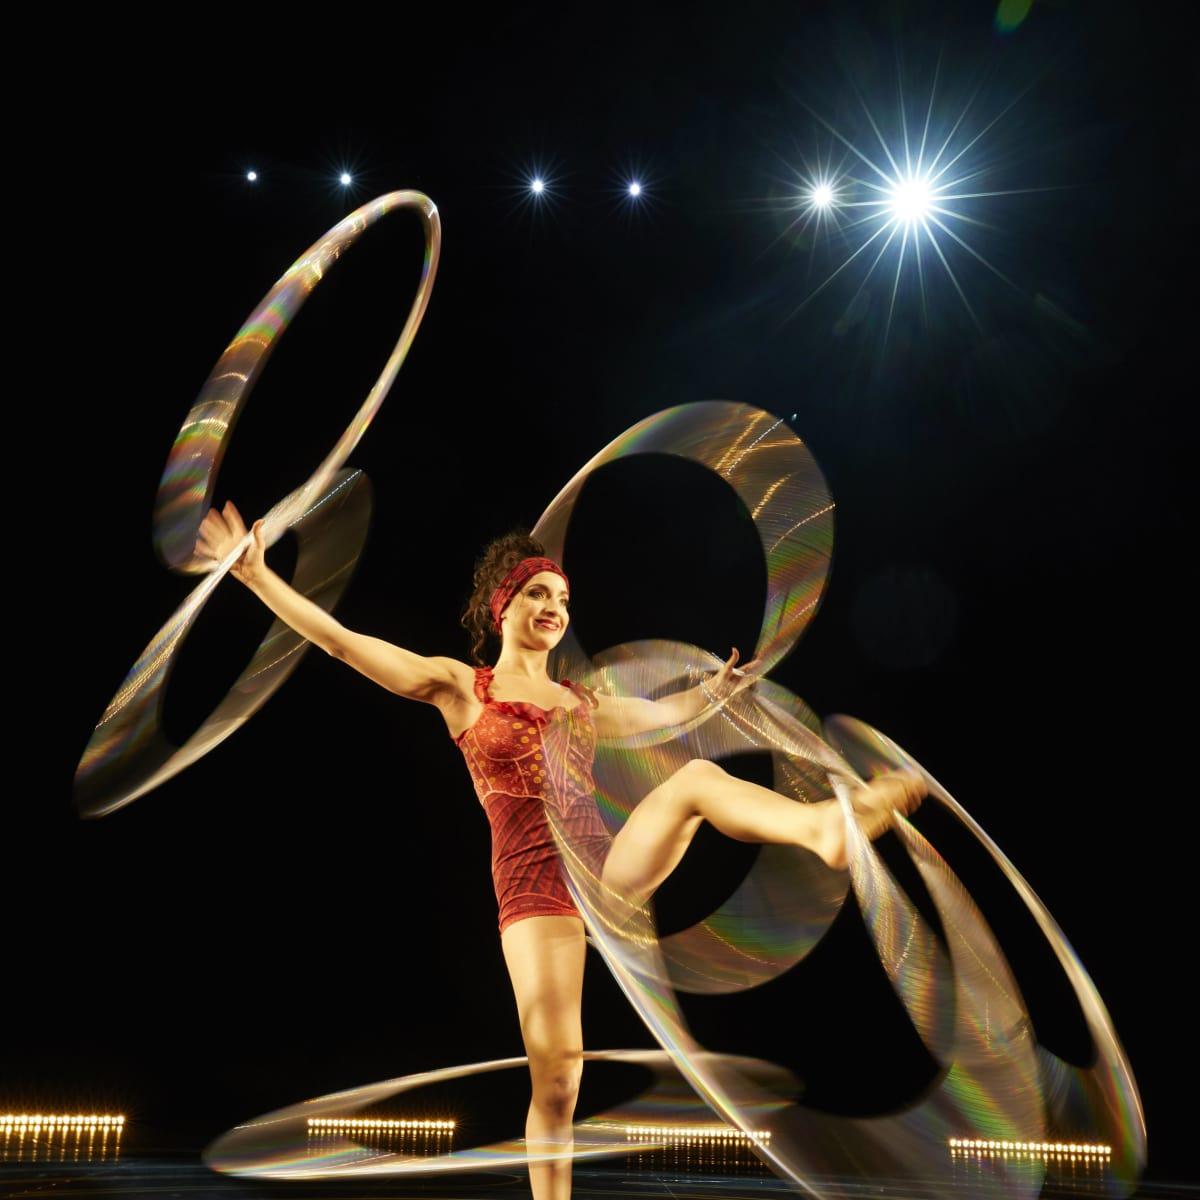 Cirque du Soleil - Corteo - hula hoop